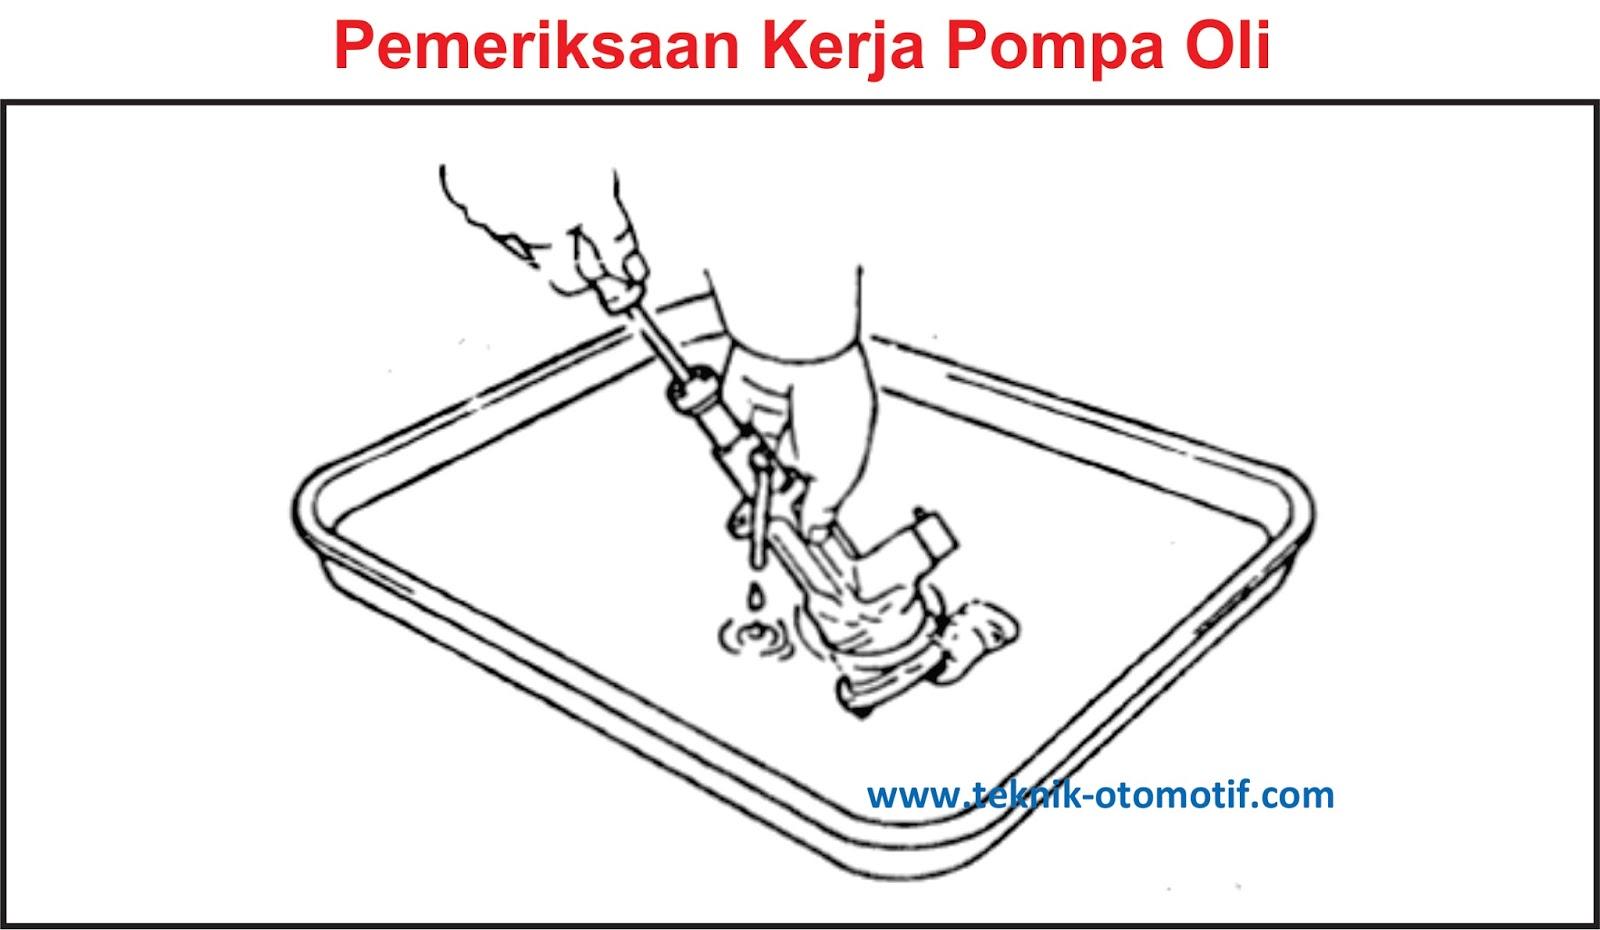 Pemeriksaan Pompa Oli Oil Pump